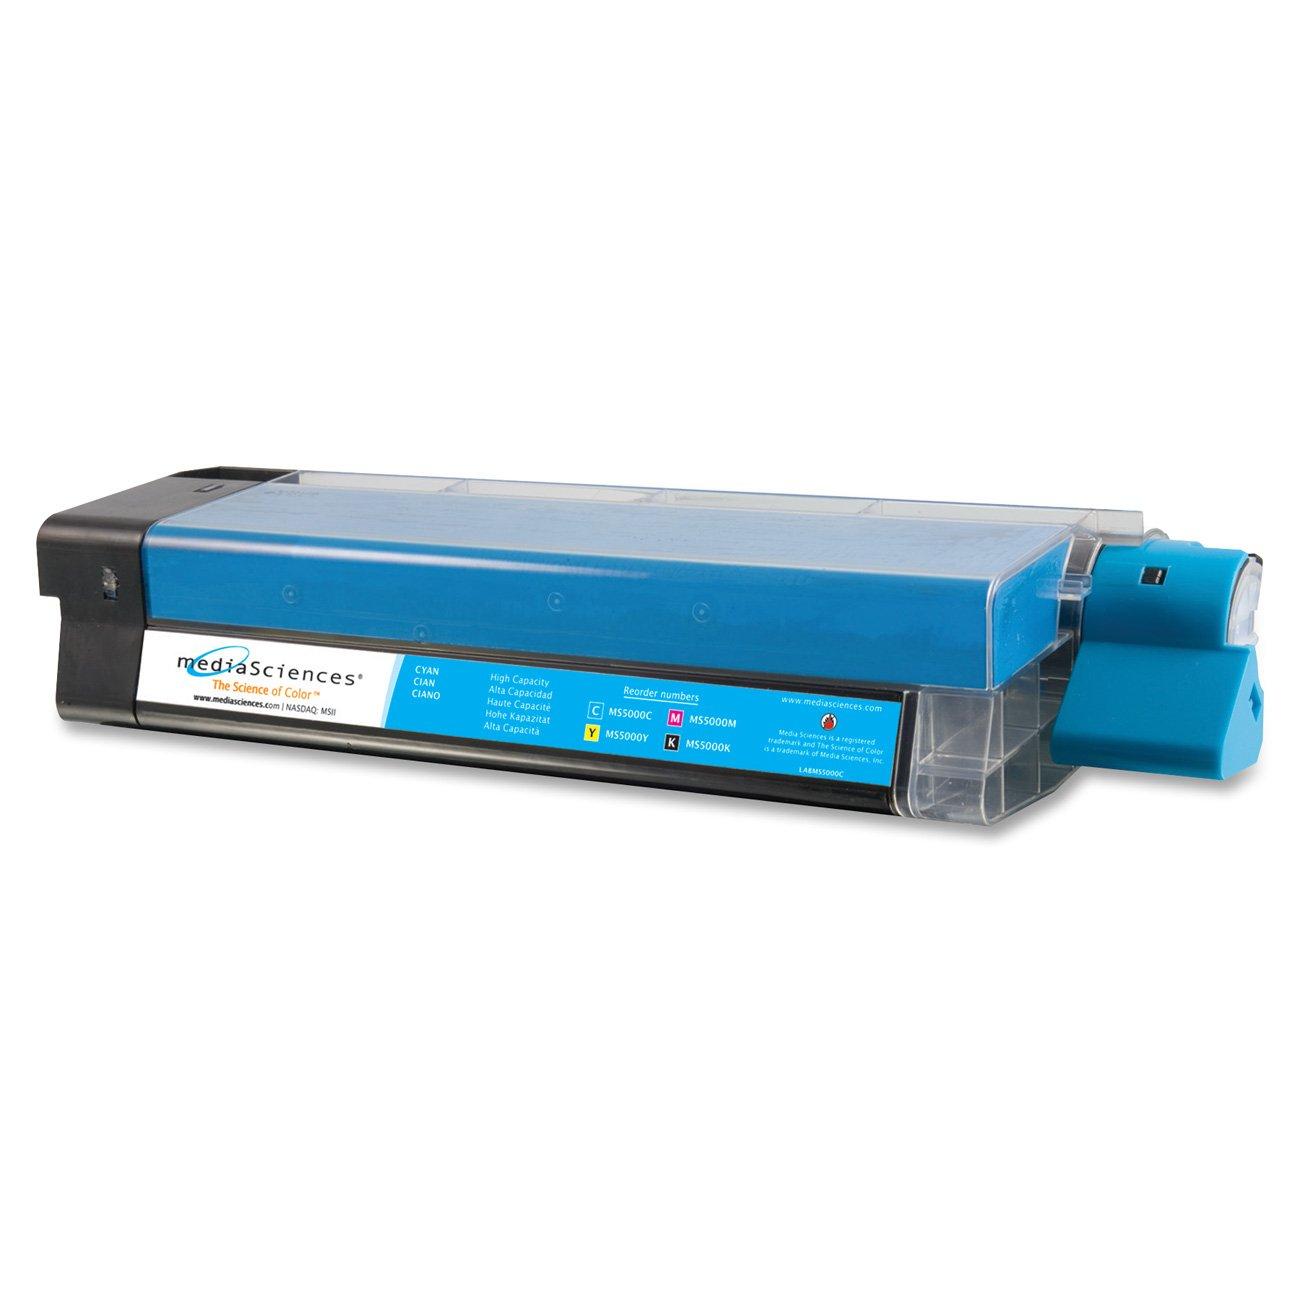 MEDIA SCIENCES MS5000C Laser toner, okidata c5000 series, 42127403 compatible, cyan